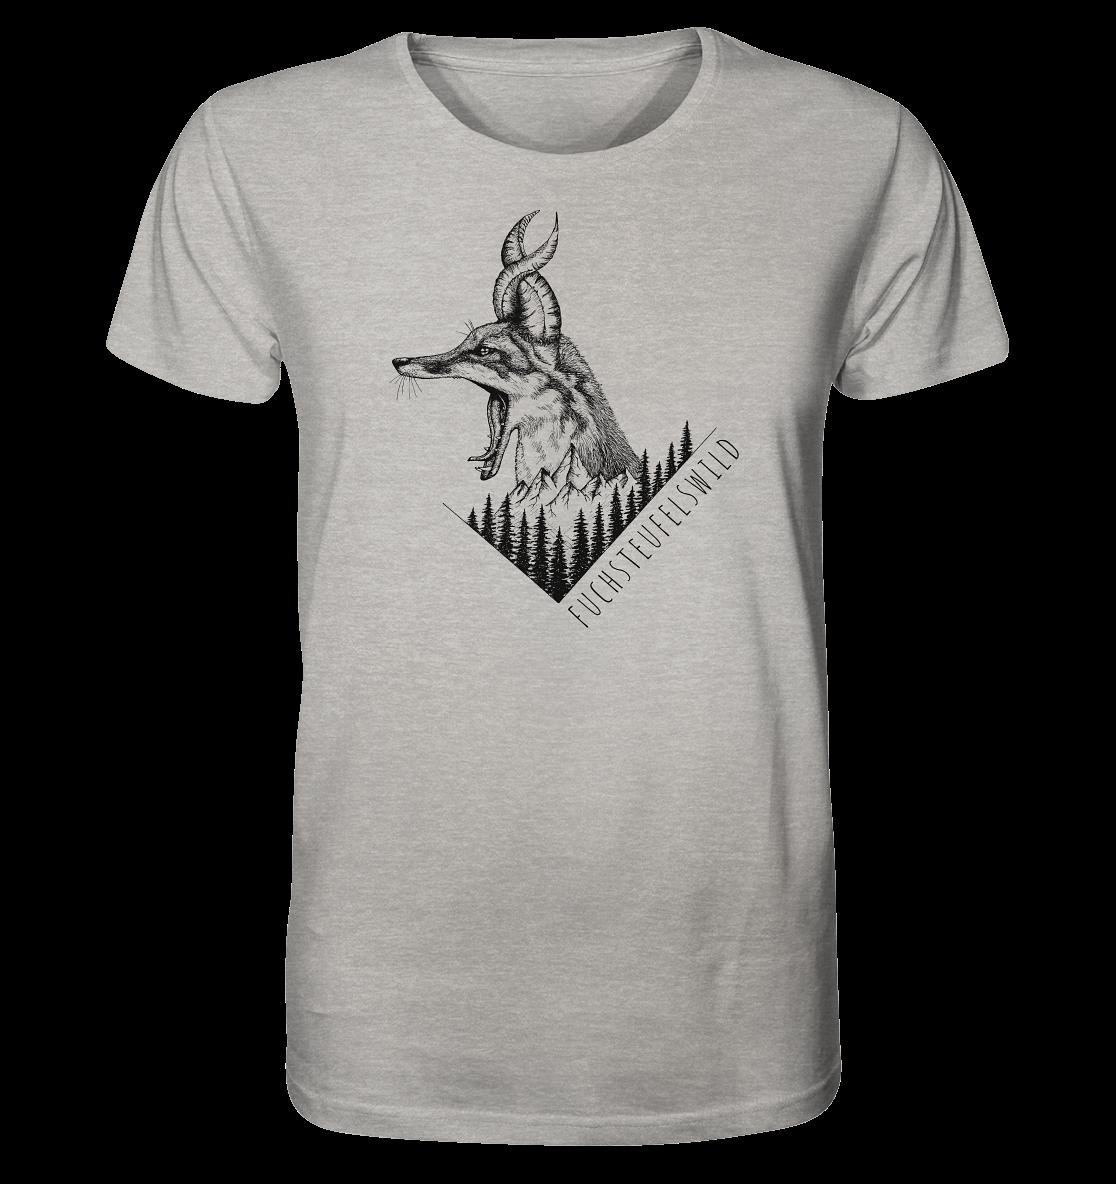 front-organic-shirt-meliert-c2c1c0-1116x-4.png